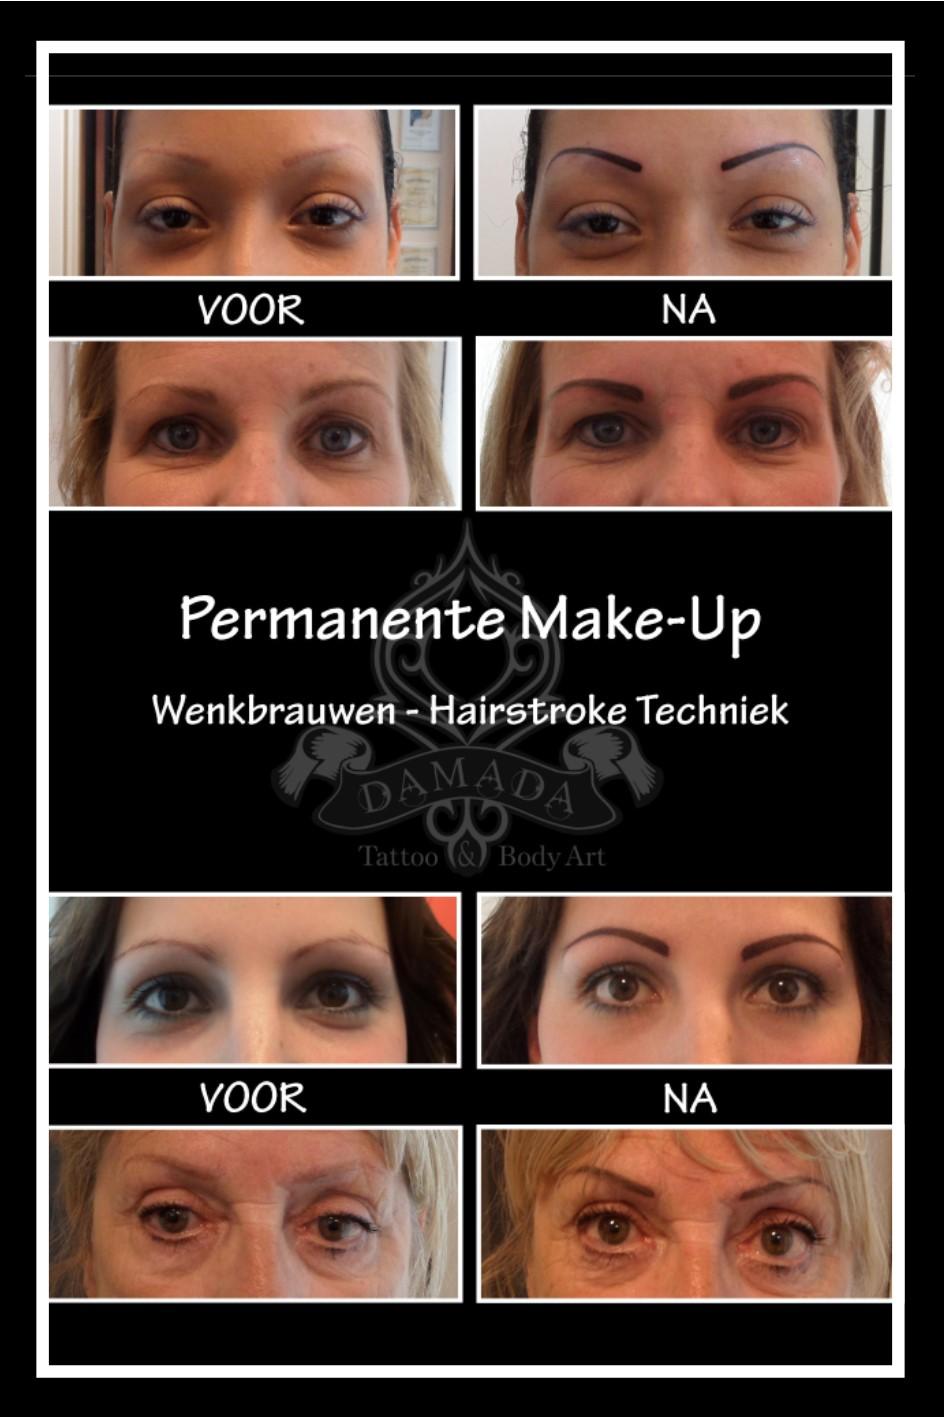 Eyebrow hairstroke